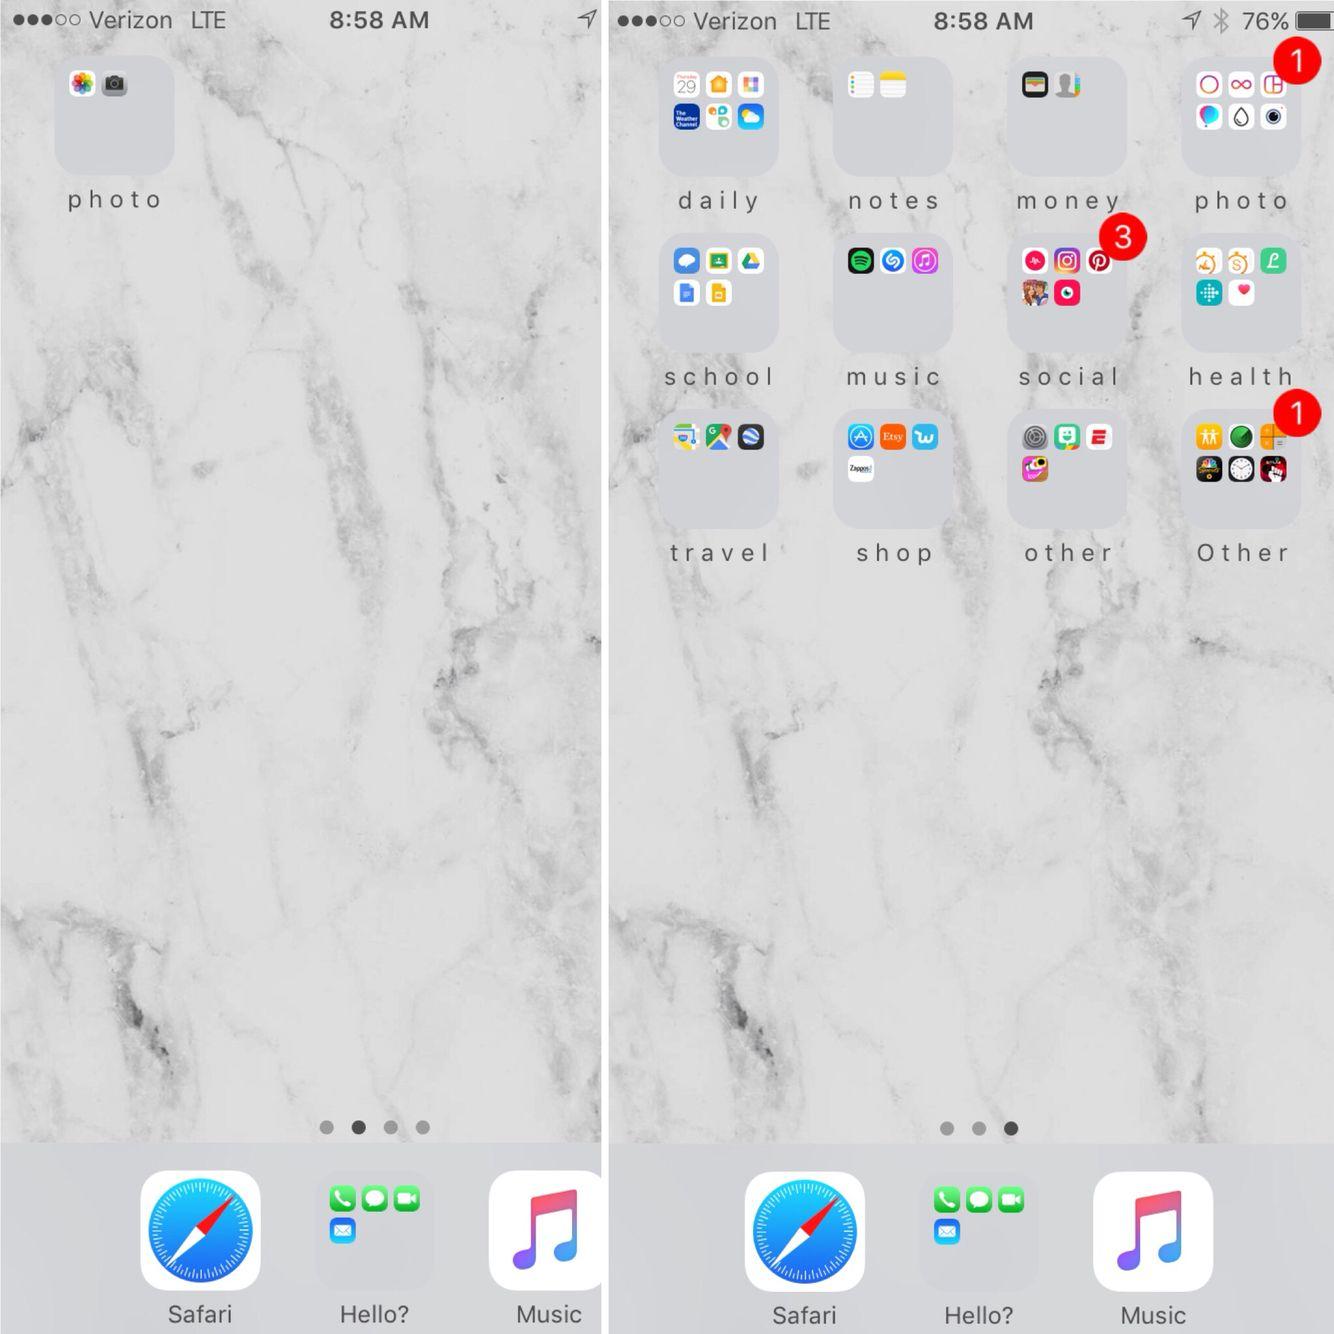 Phone Organization Great Way To Stay Organized Iphone Organization Organization Apps Phone Organization